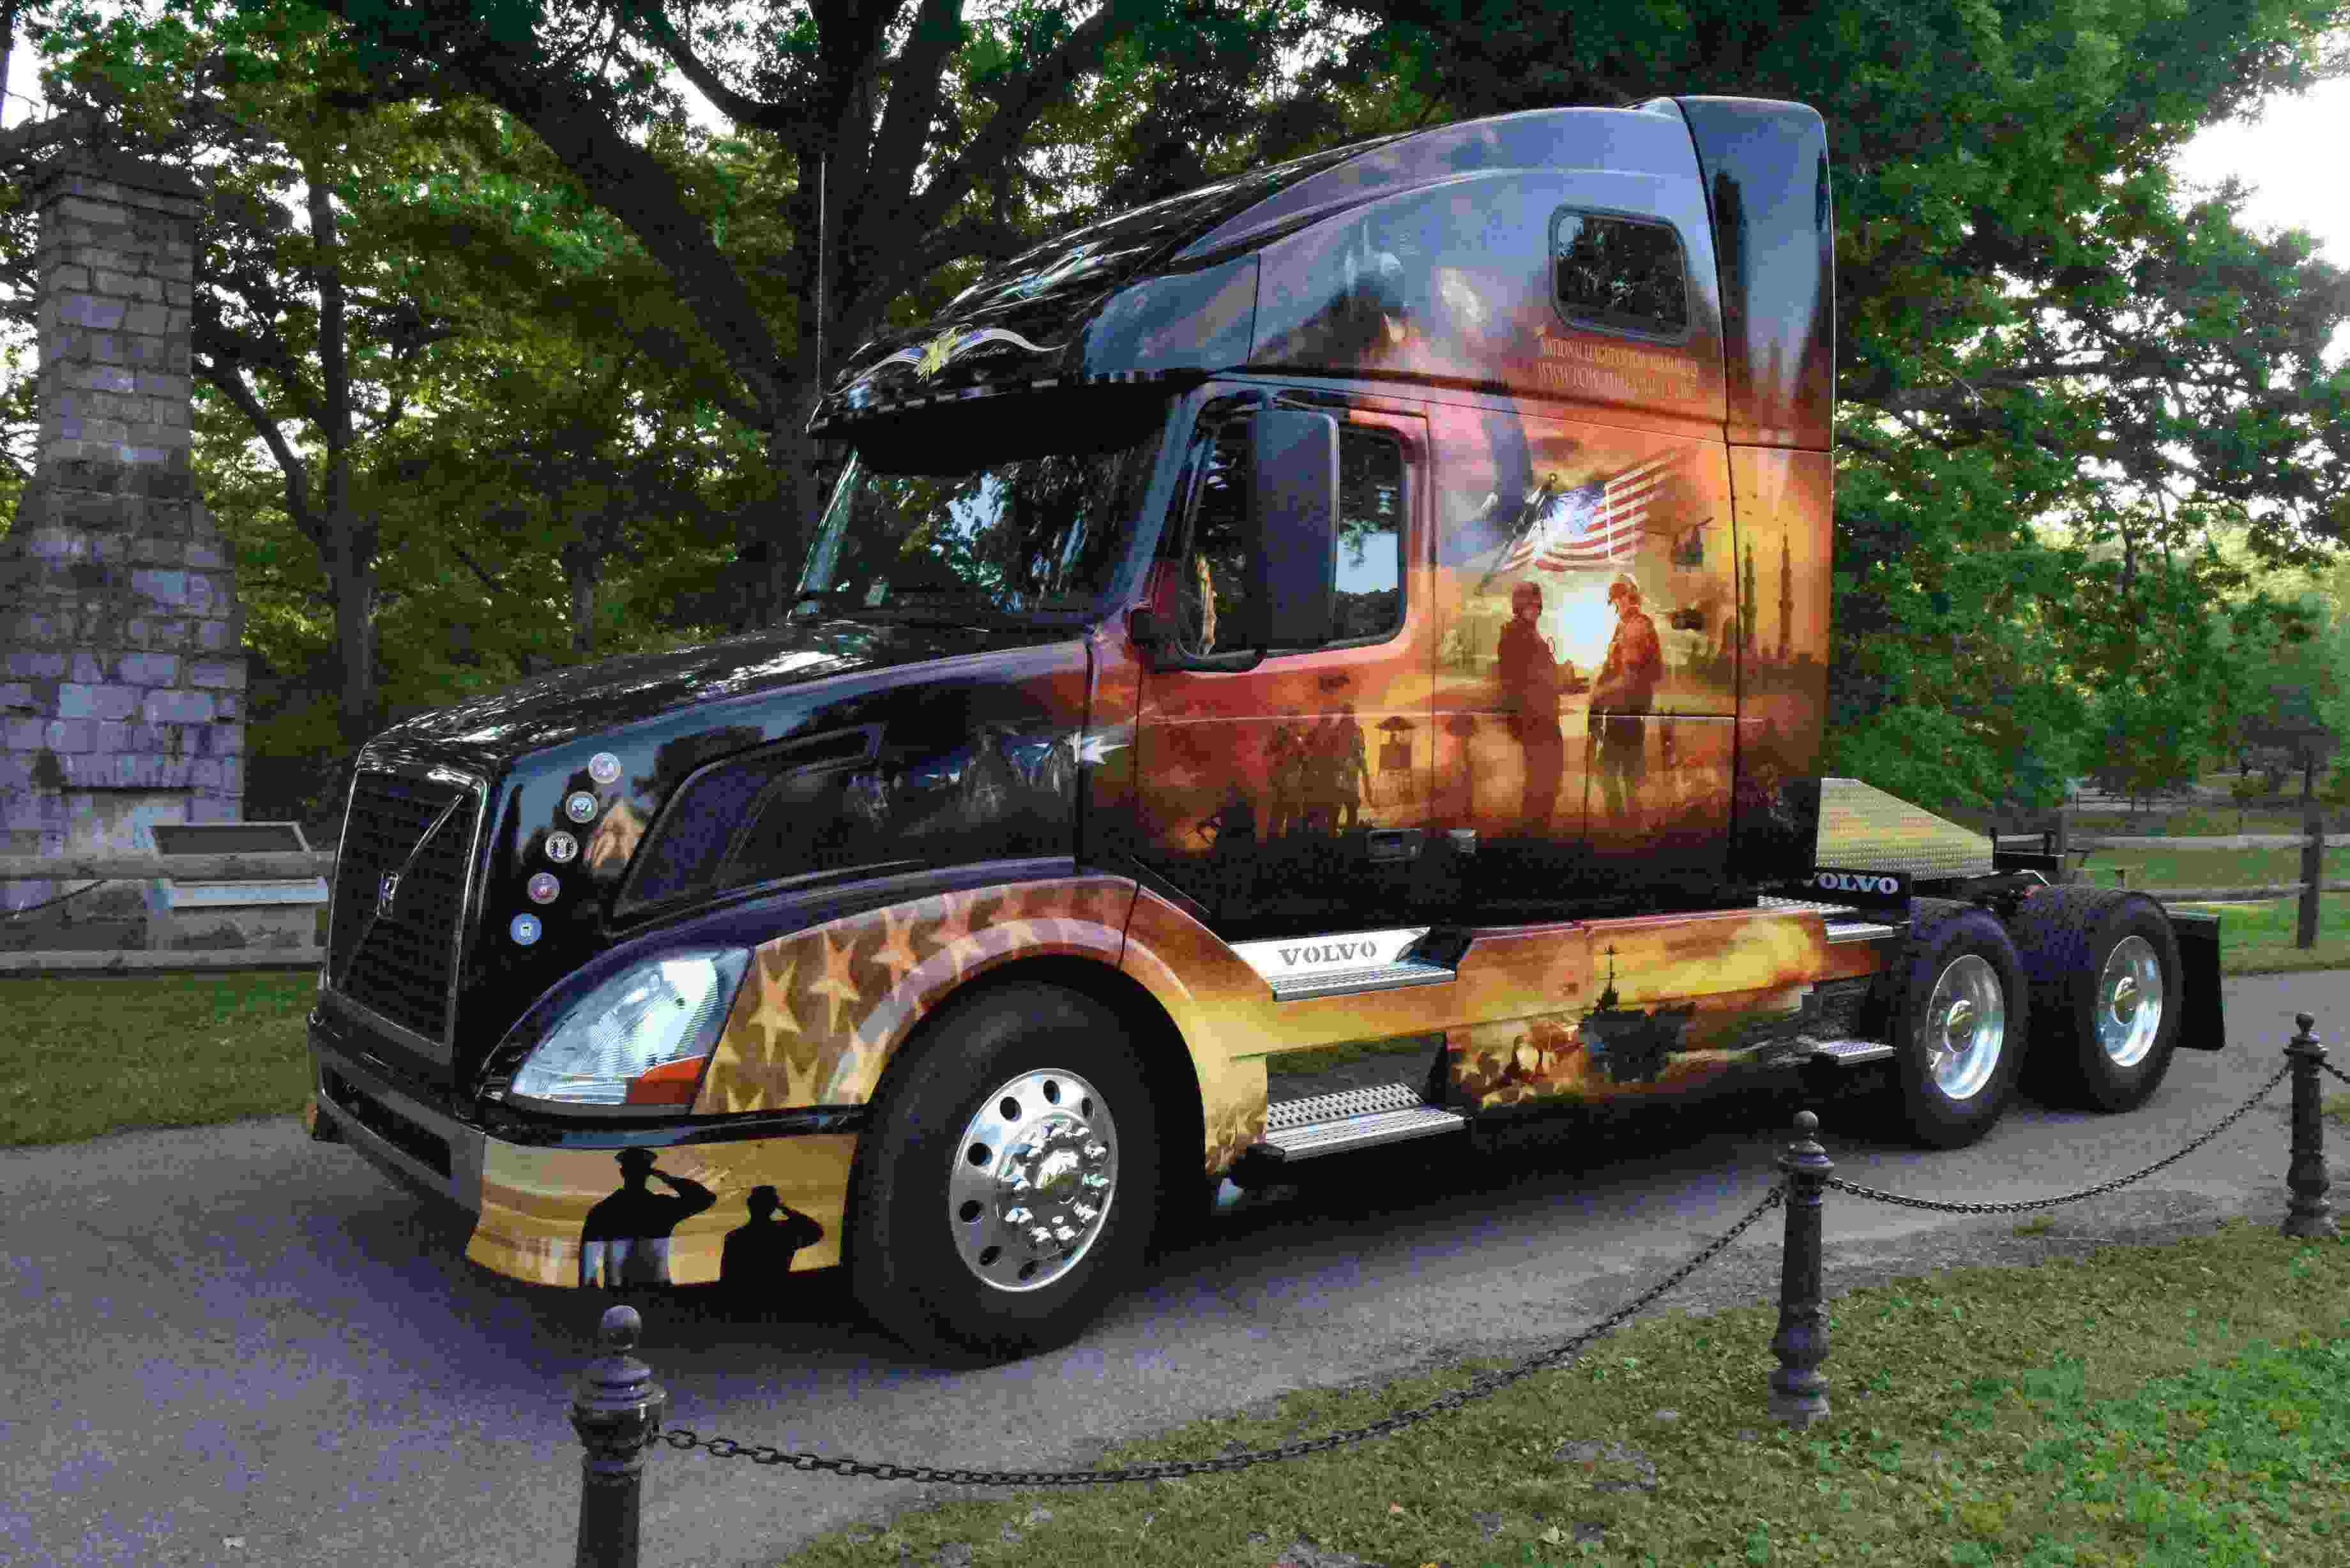 Volvo, Mack honor service members with Memorial Day tribute trucks